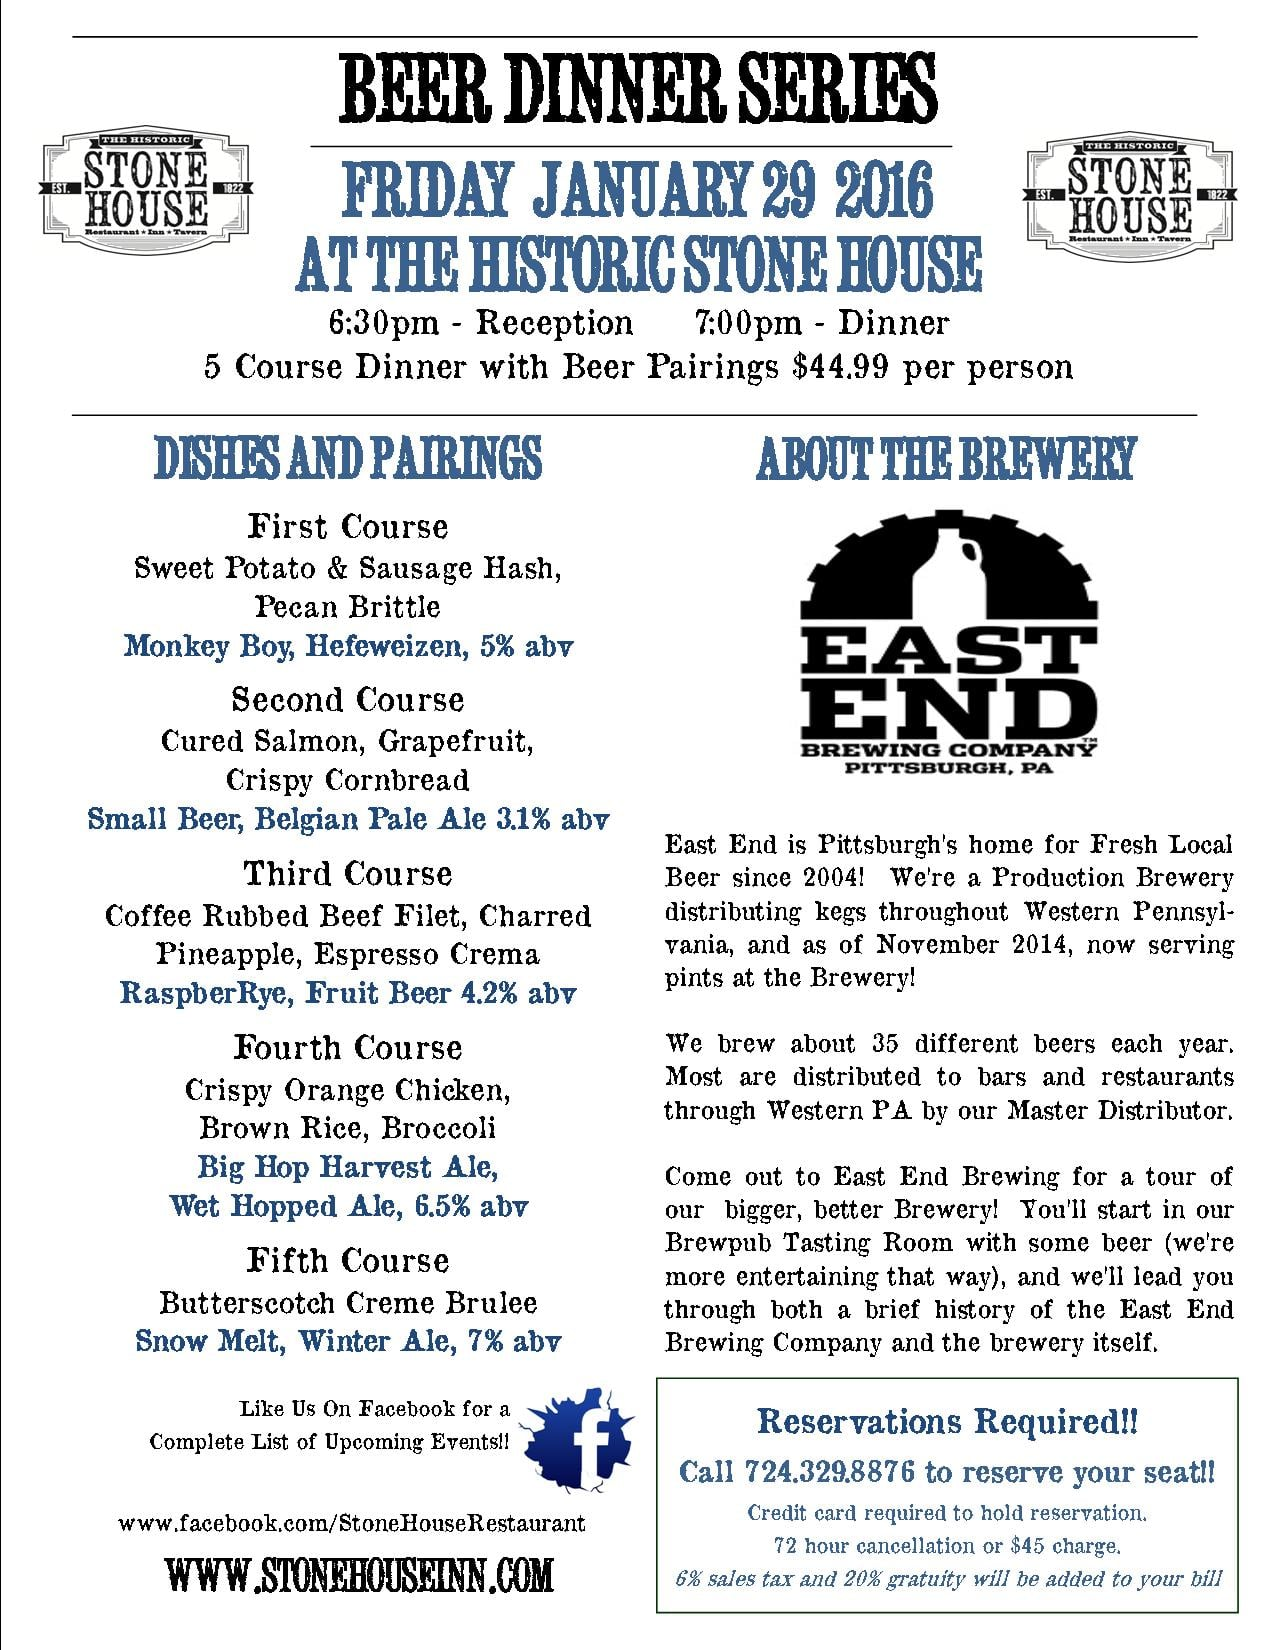 East End Brewing Flyer 1.29.16 (1).jpg